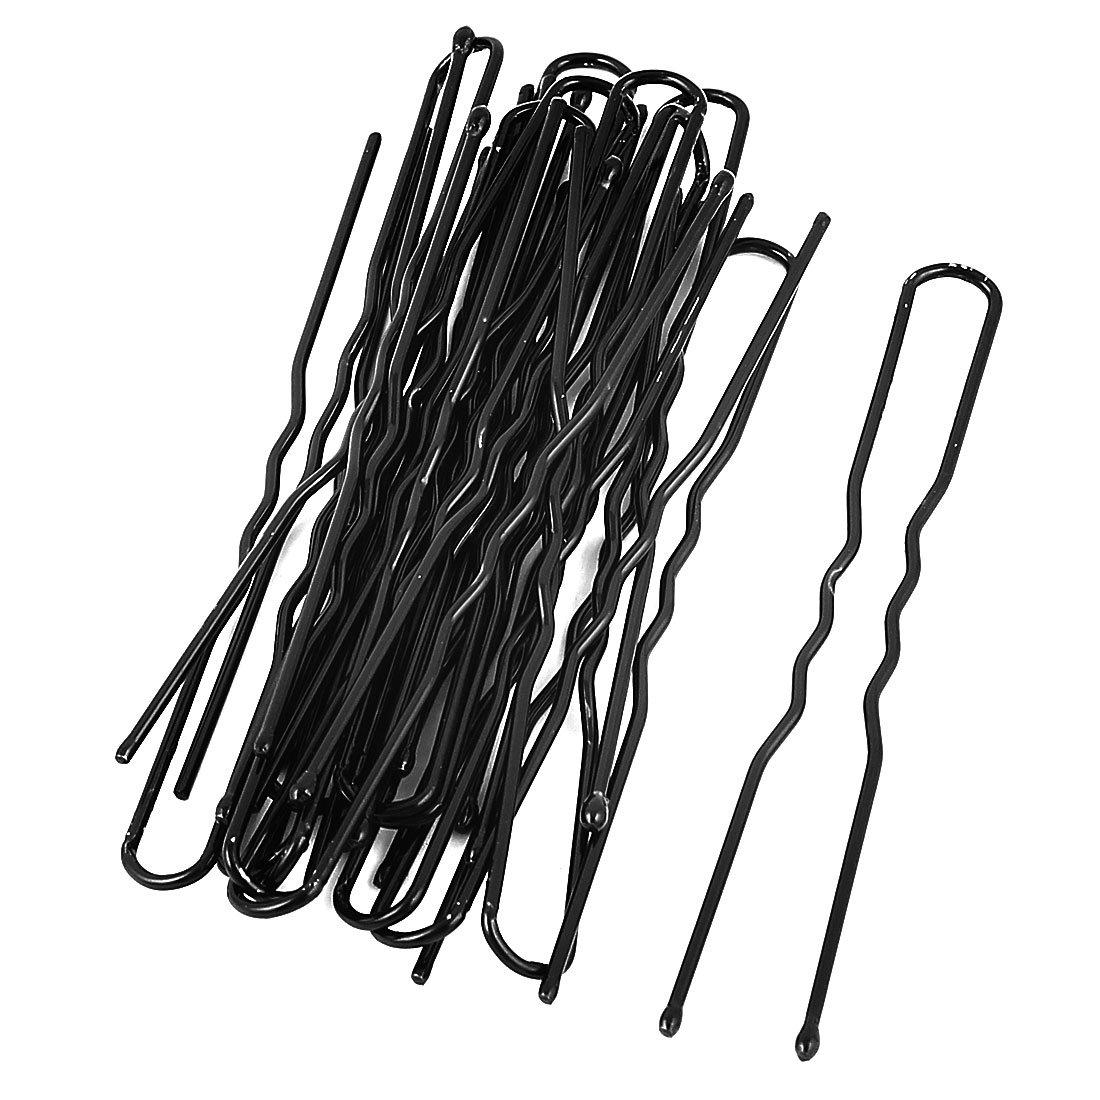 uxcell Metal Woman Hair Barrette U Shaped Single Prong DIY Hairstyle Clips 20 Pcs Black US-SA-AJD-93642